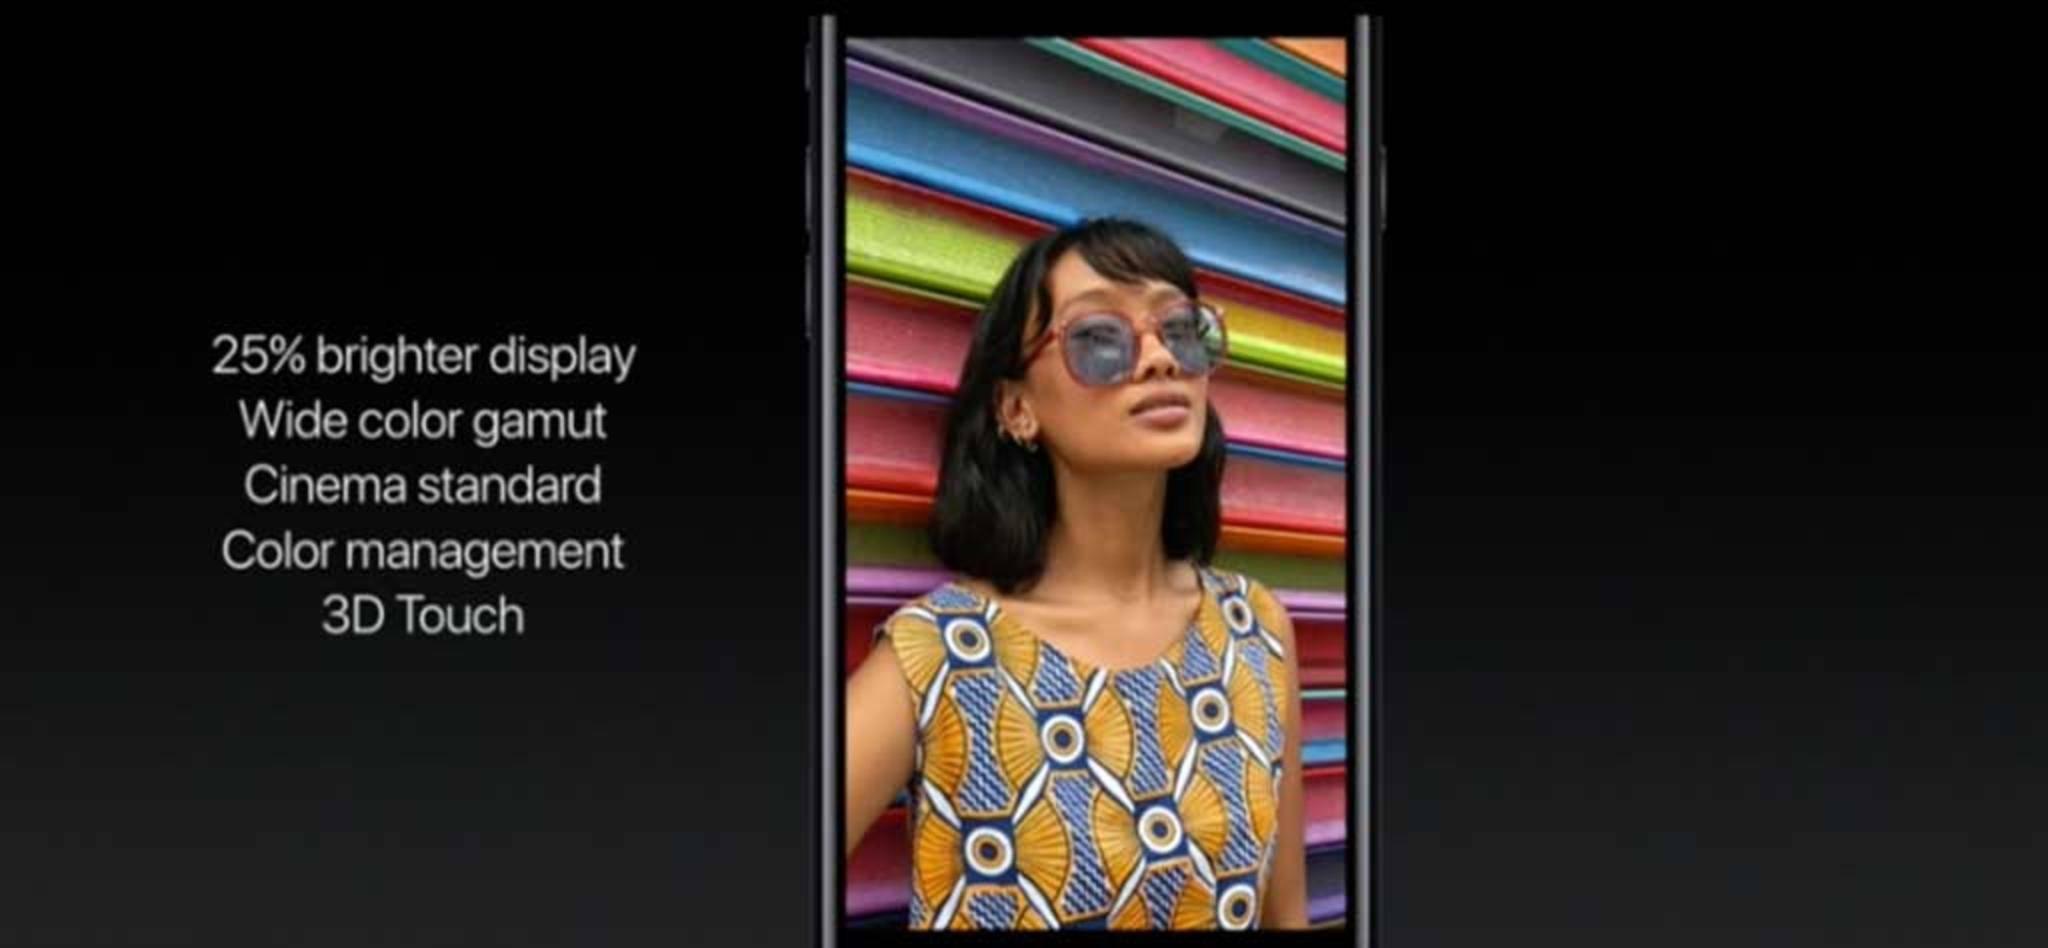 iphone7-display-features.jpg